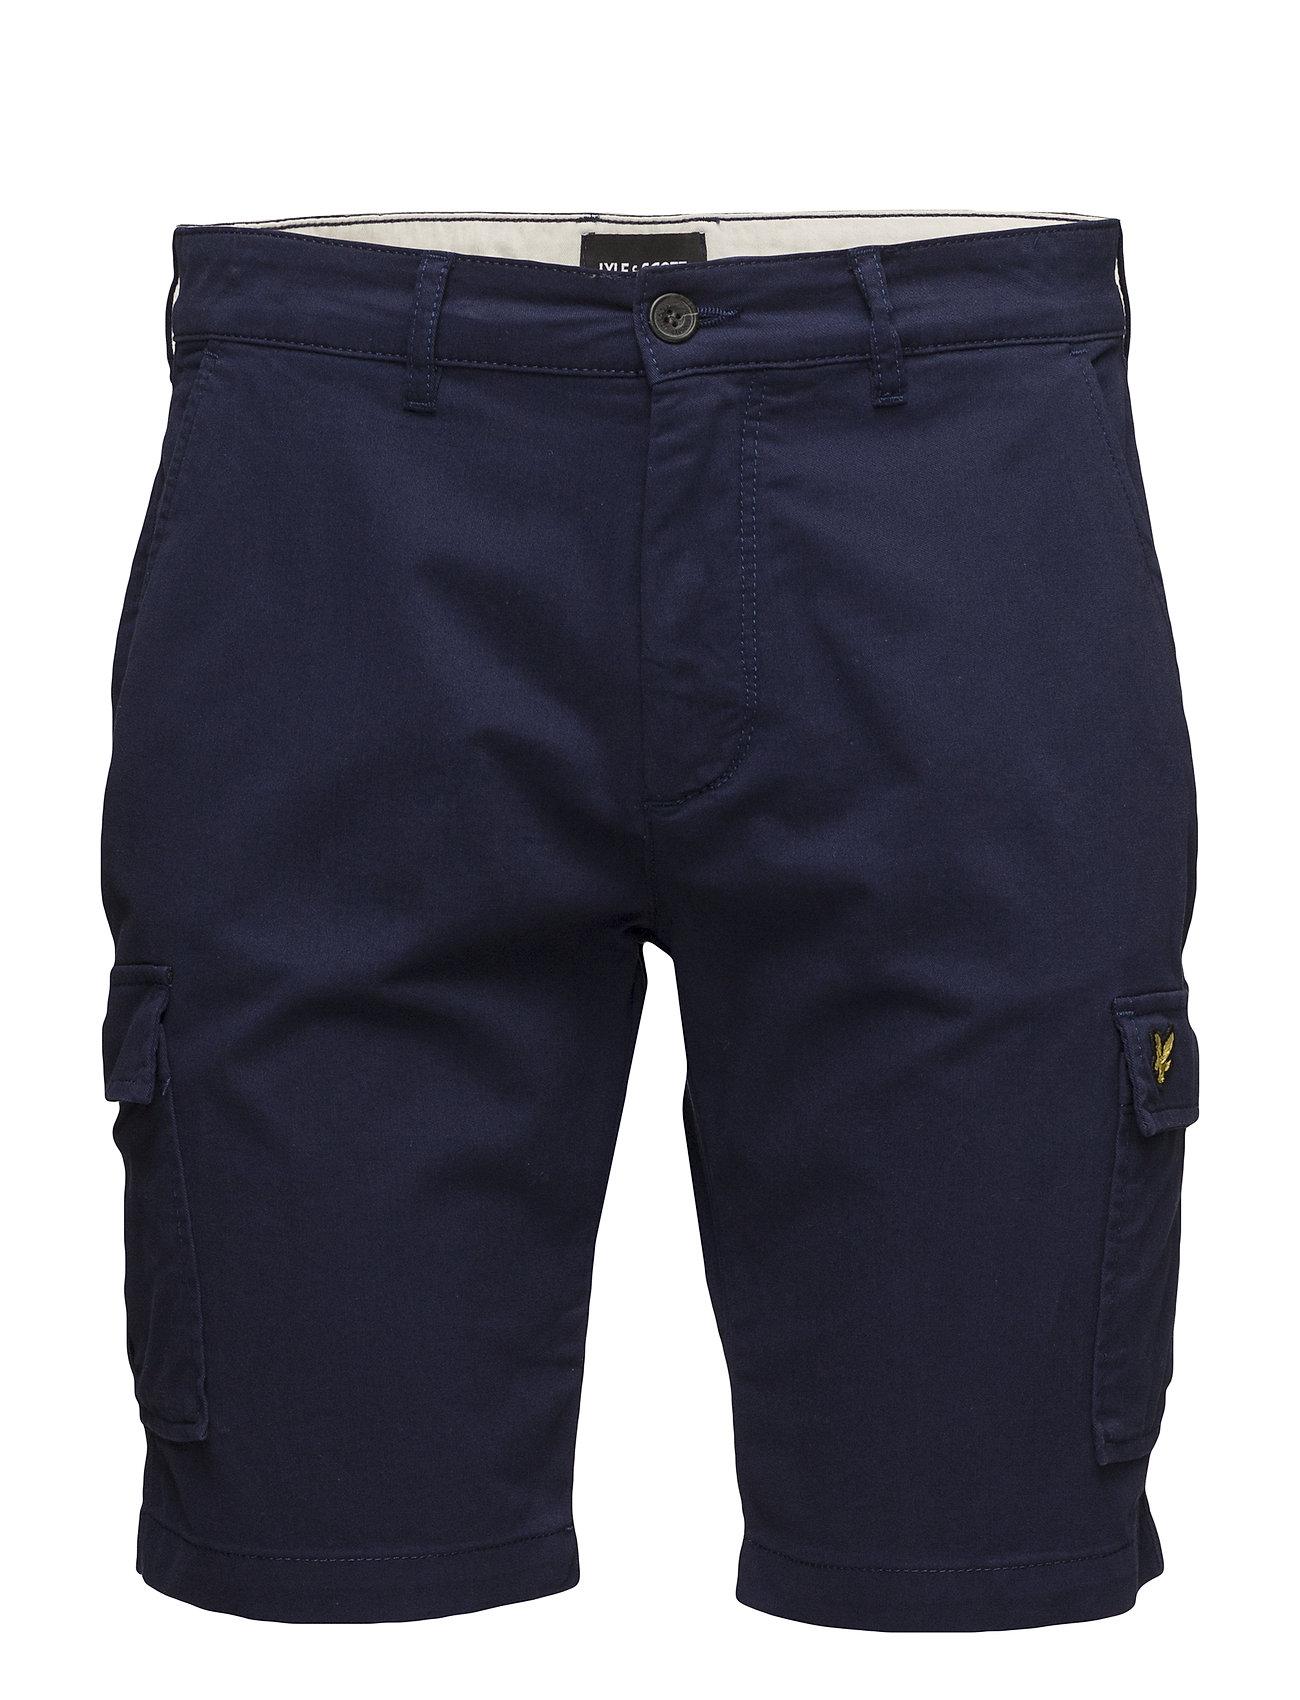 Image of Cargo Short (2963260173)